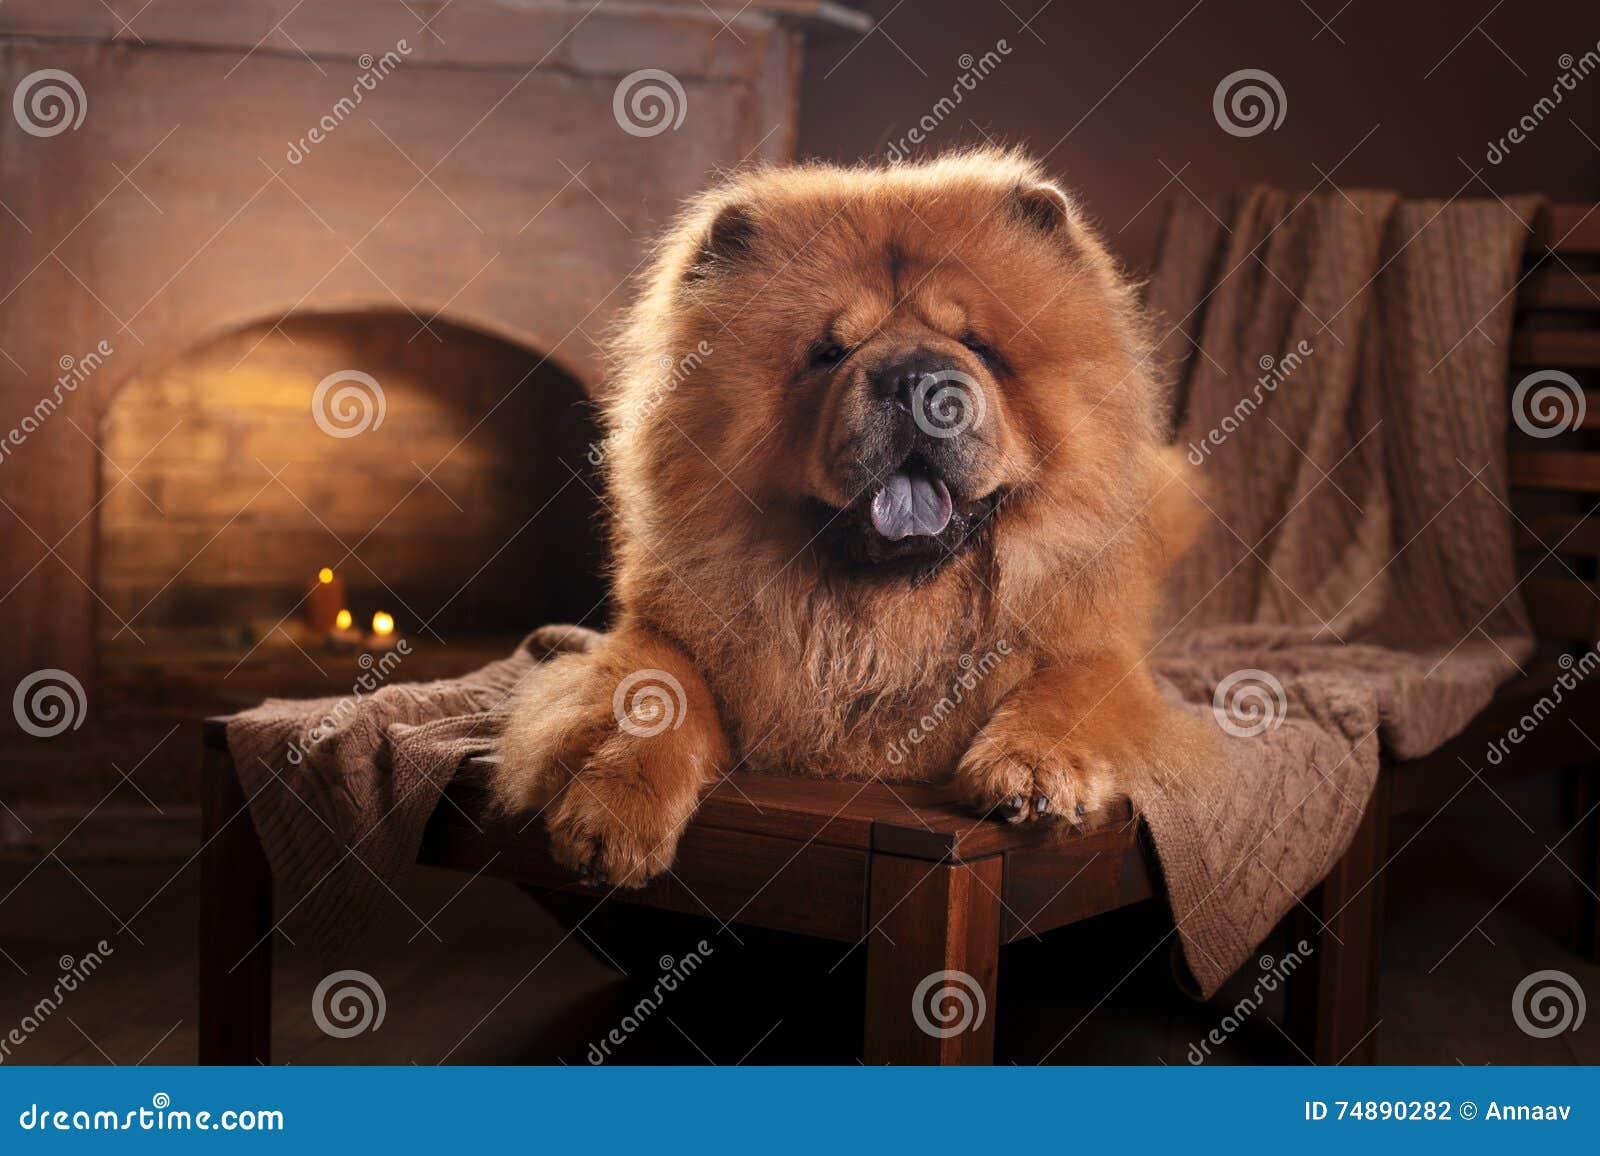 Chow διασταύρωσης σχεδίου αναδρομικό ύφος καρτών σκυλιών grunge παλαιό